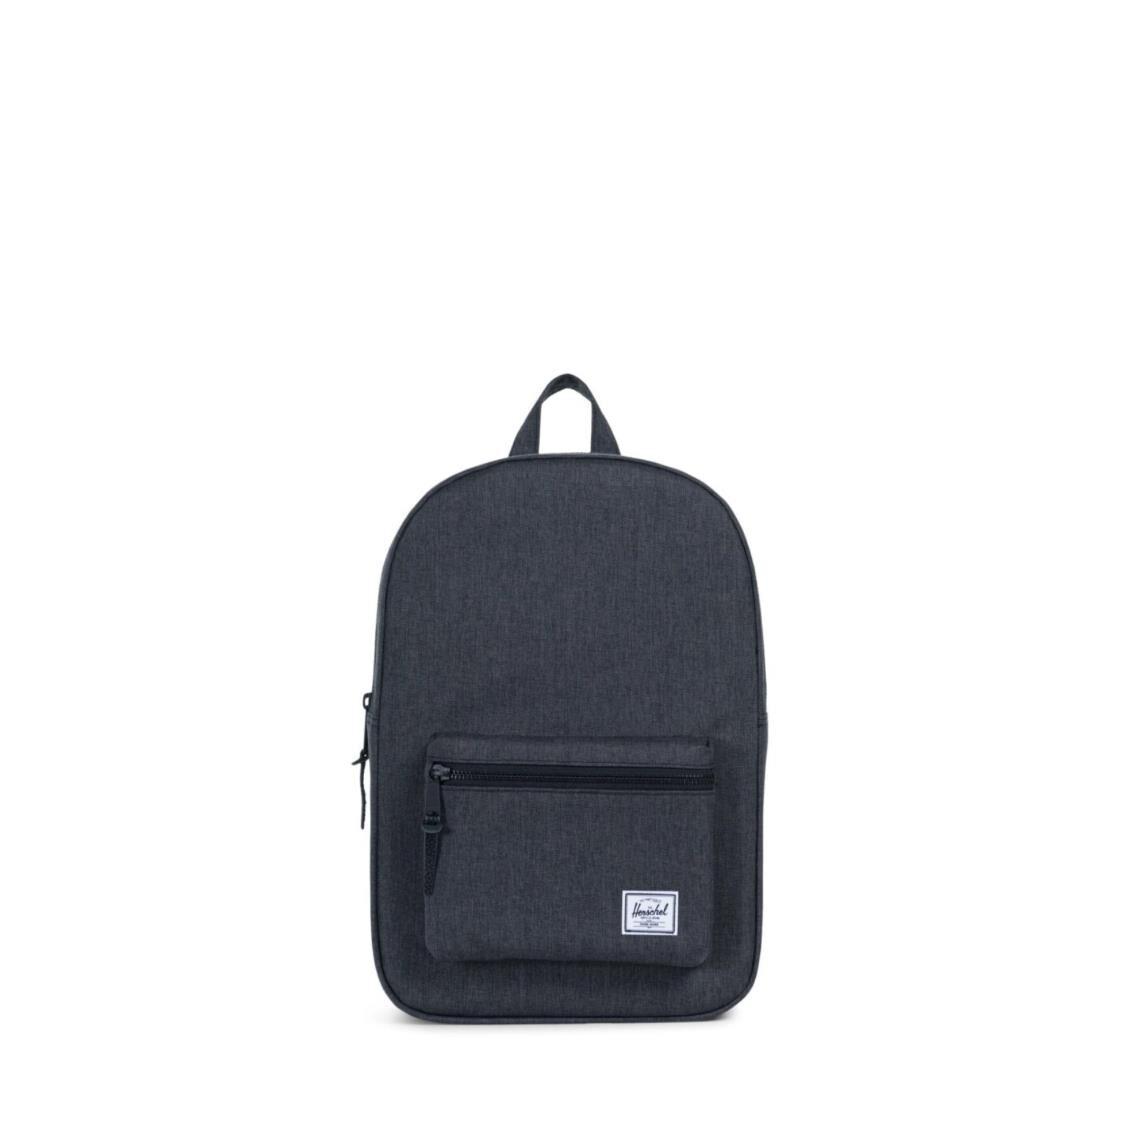 Herschel Settlement Mid-Volume Backpack - Black Crosshatch